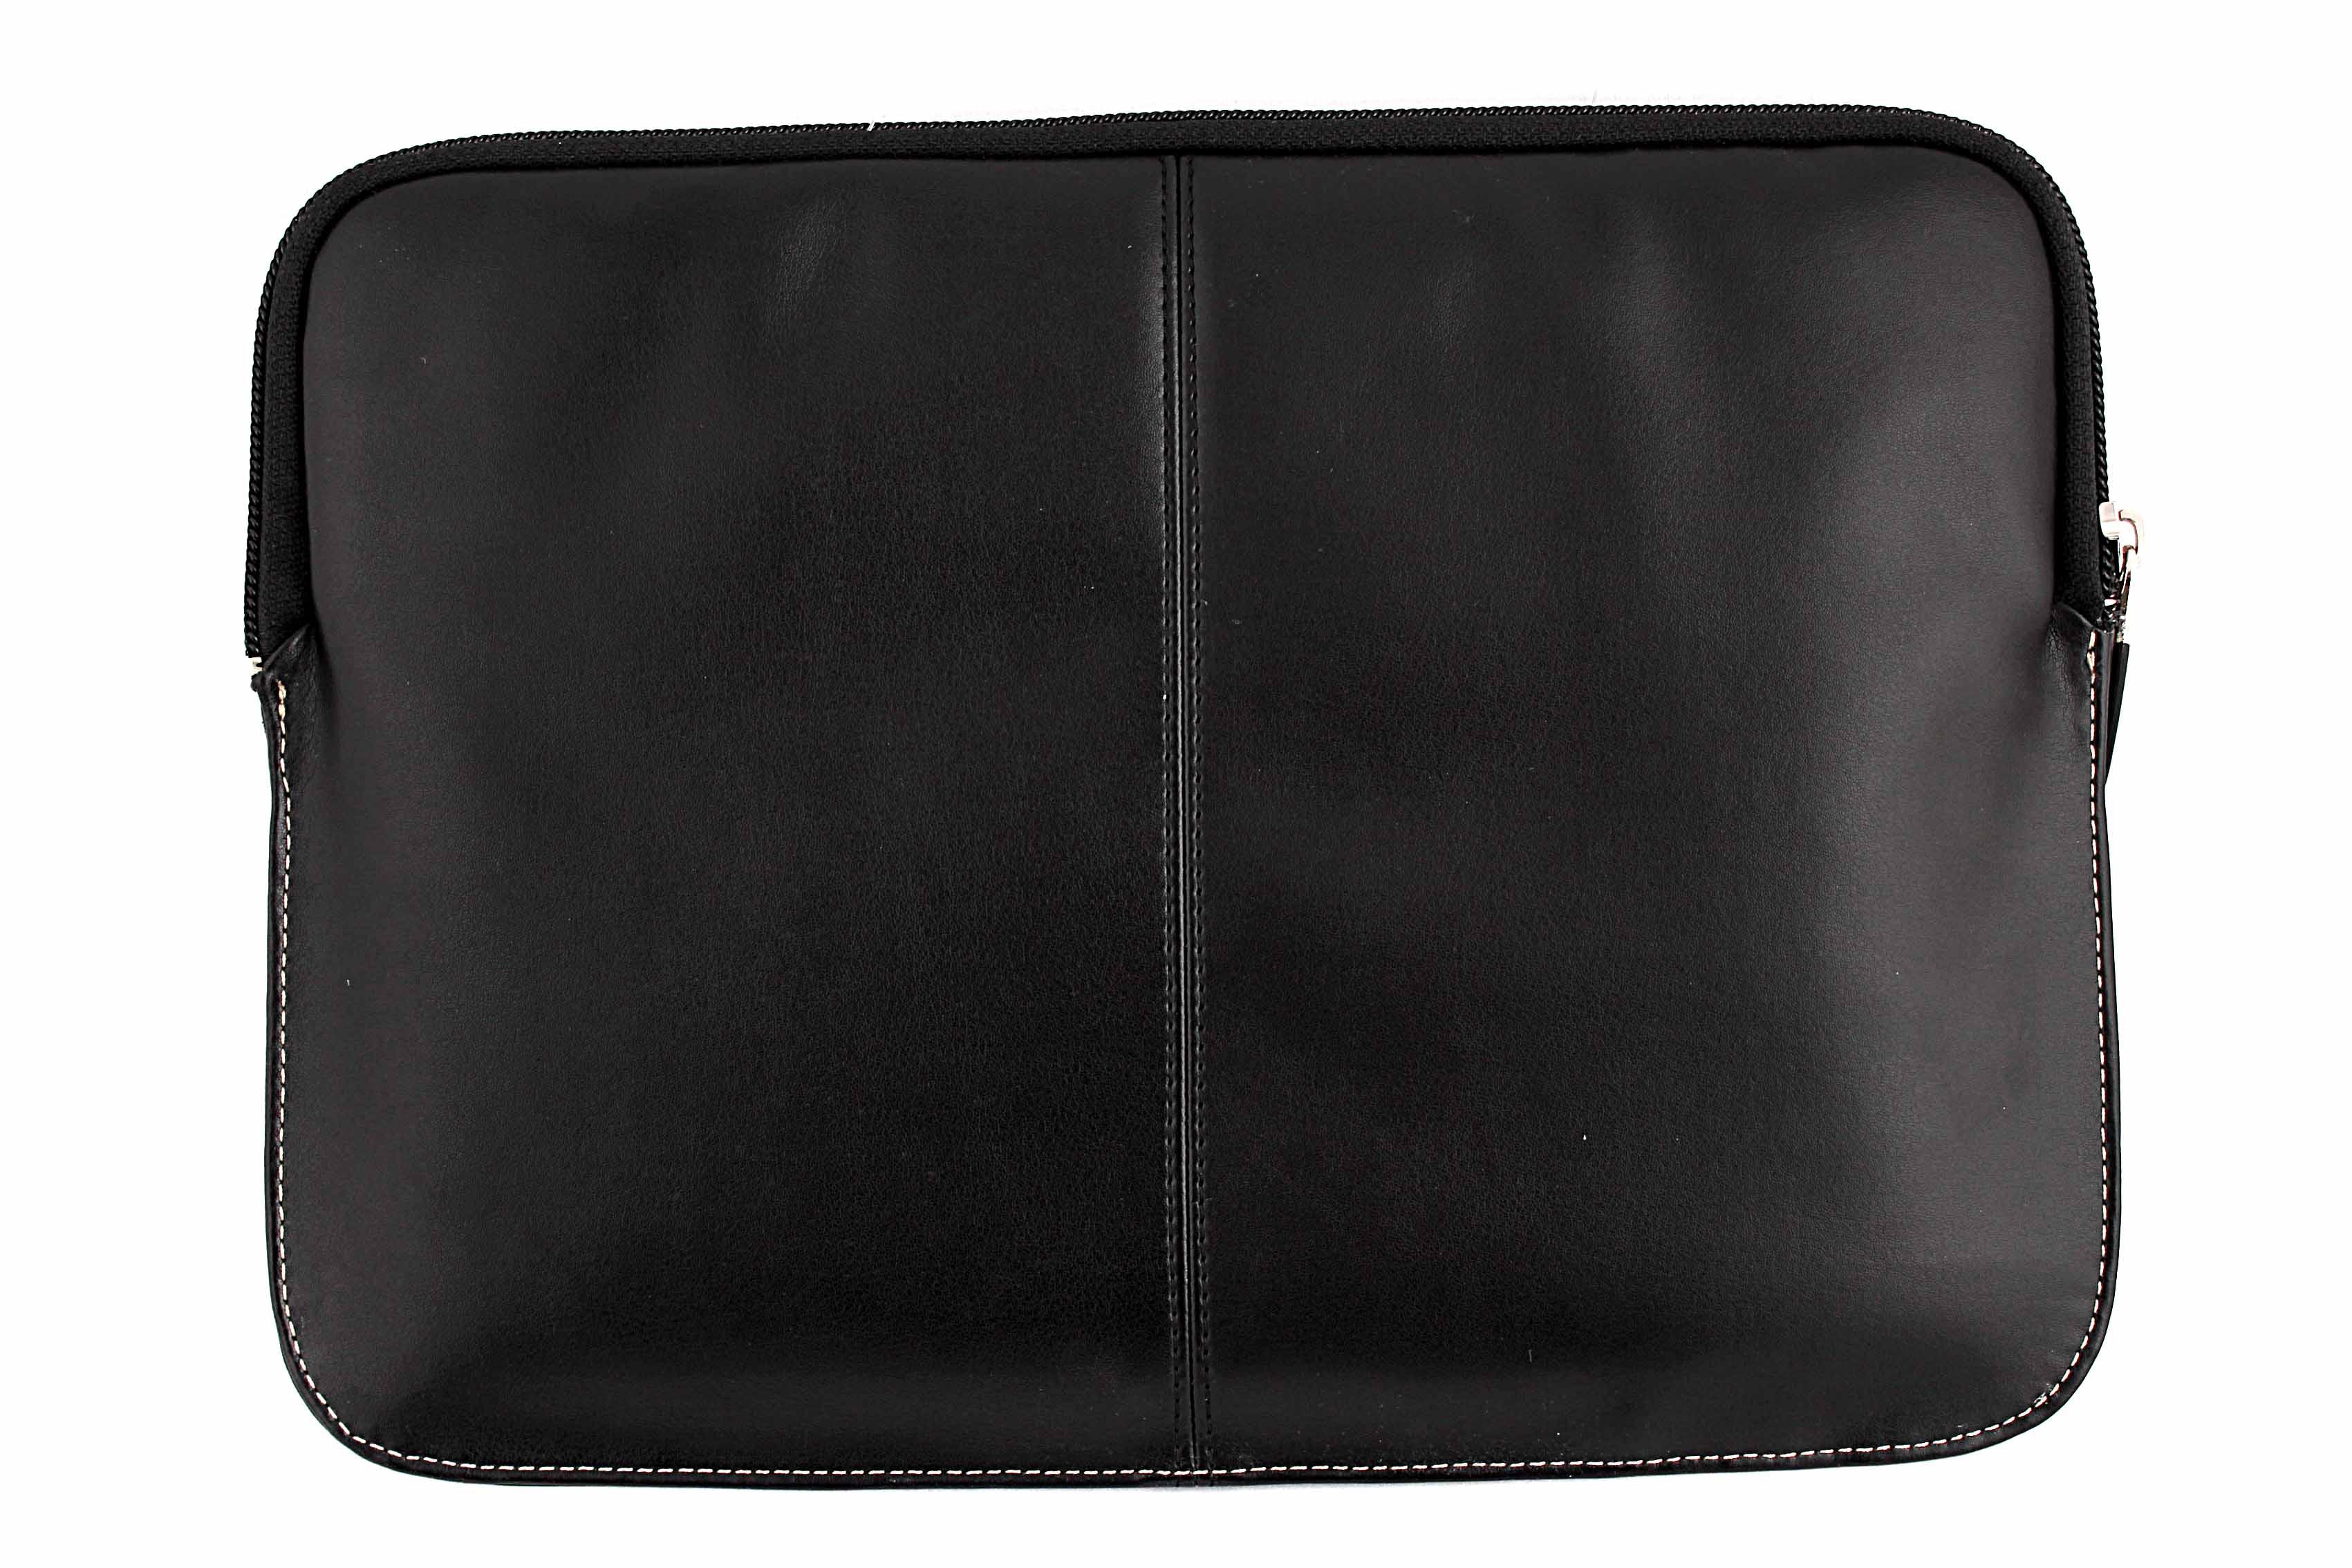 Чехол для планшетного ПК Krusell Real Brand Technics 379.000